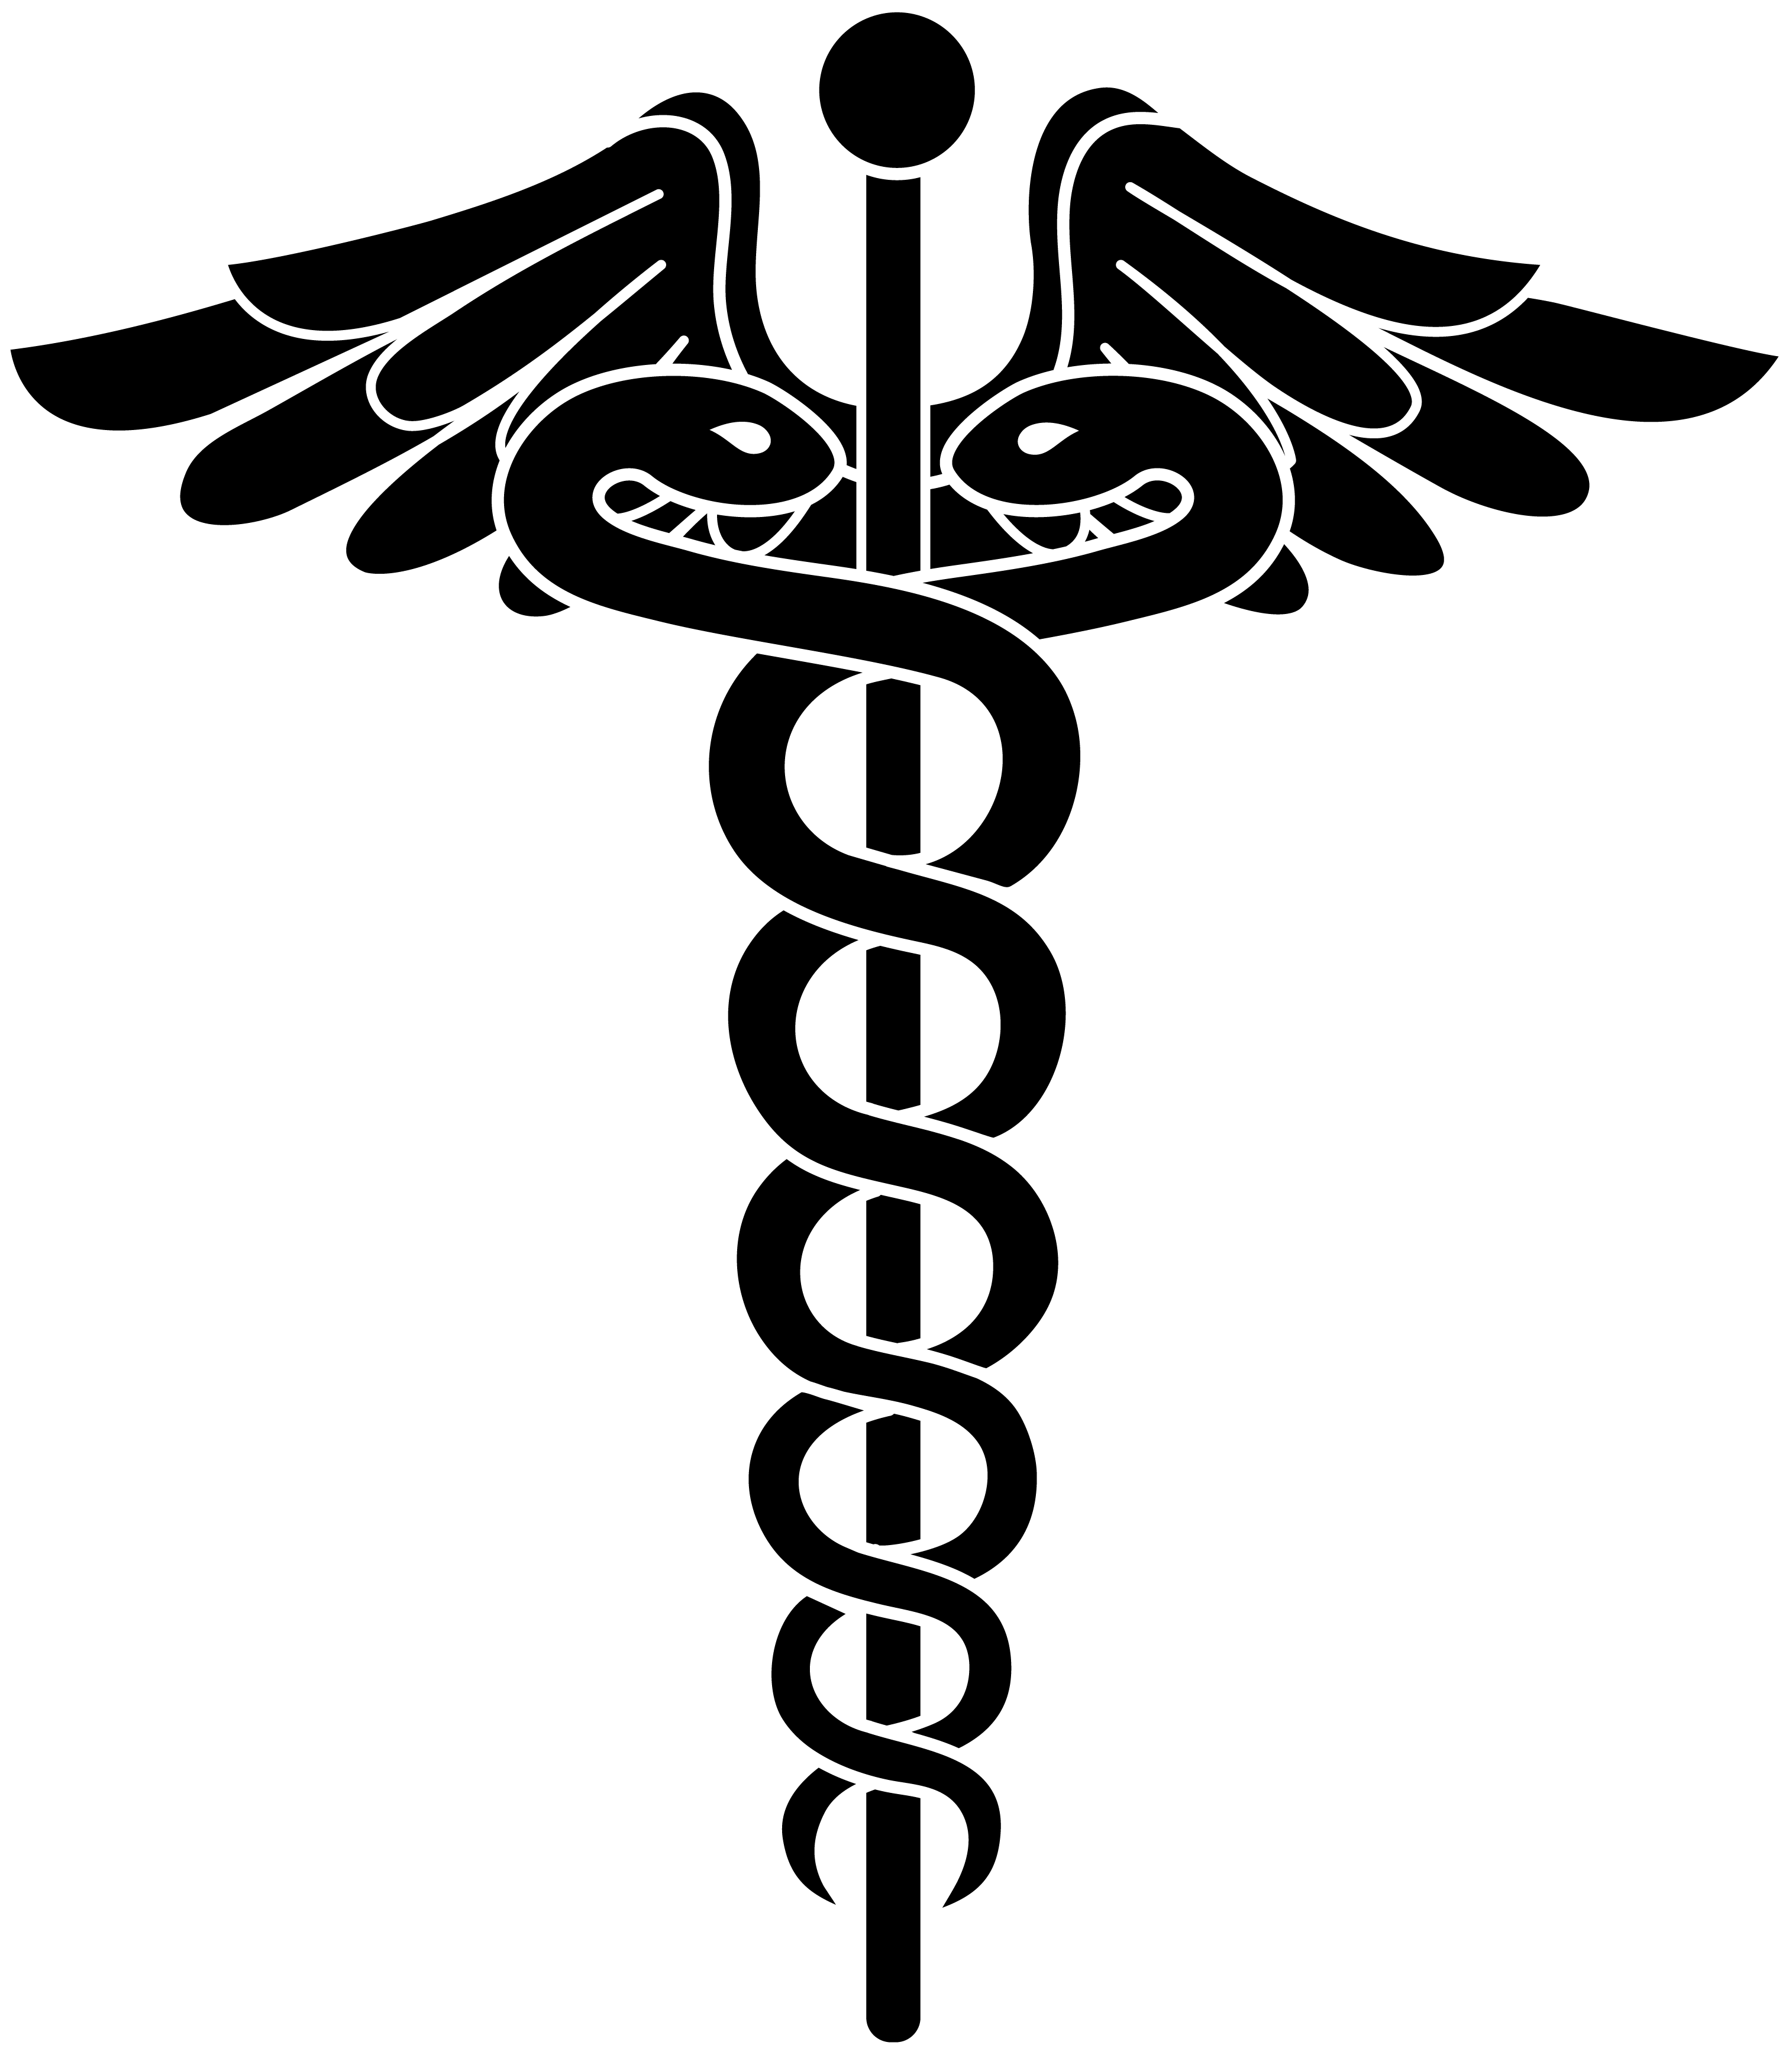 doctor logo yahoo image search results occupations pinterest rh pinterest com doctor logo wiki doctor logo png